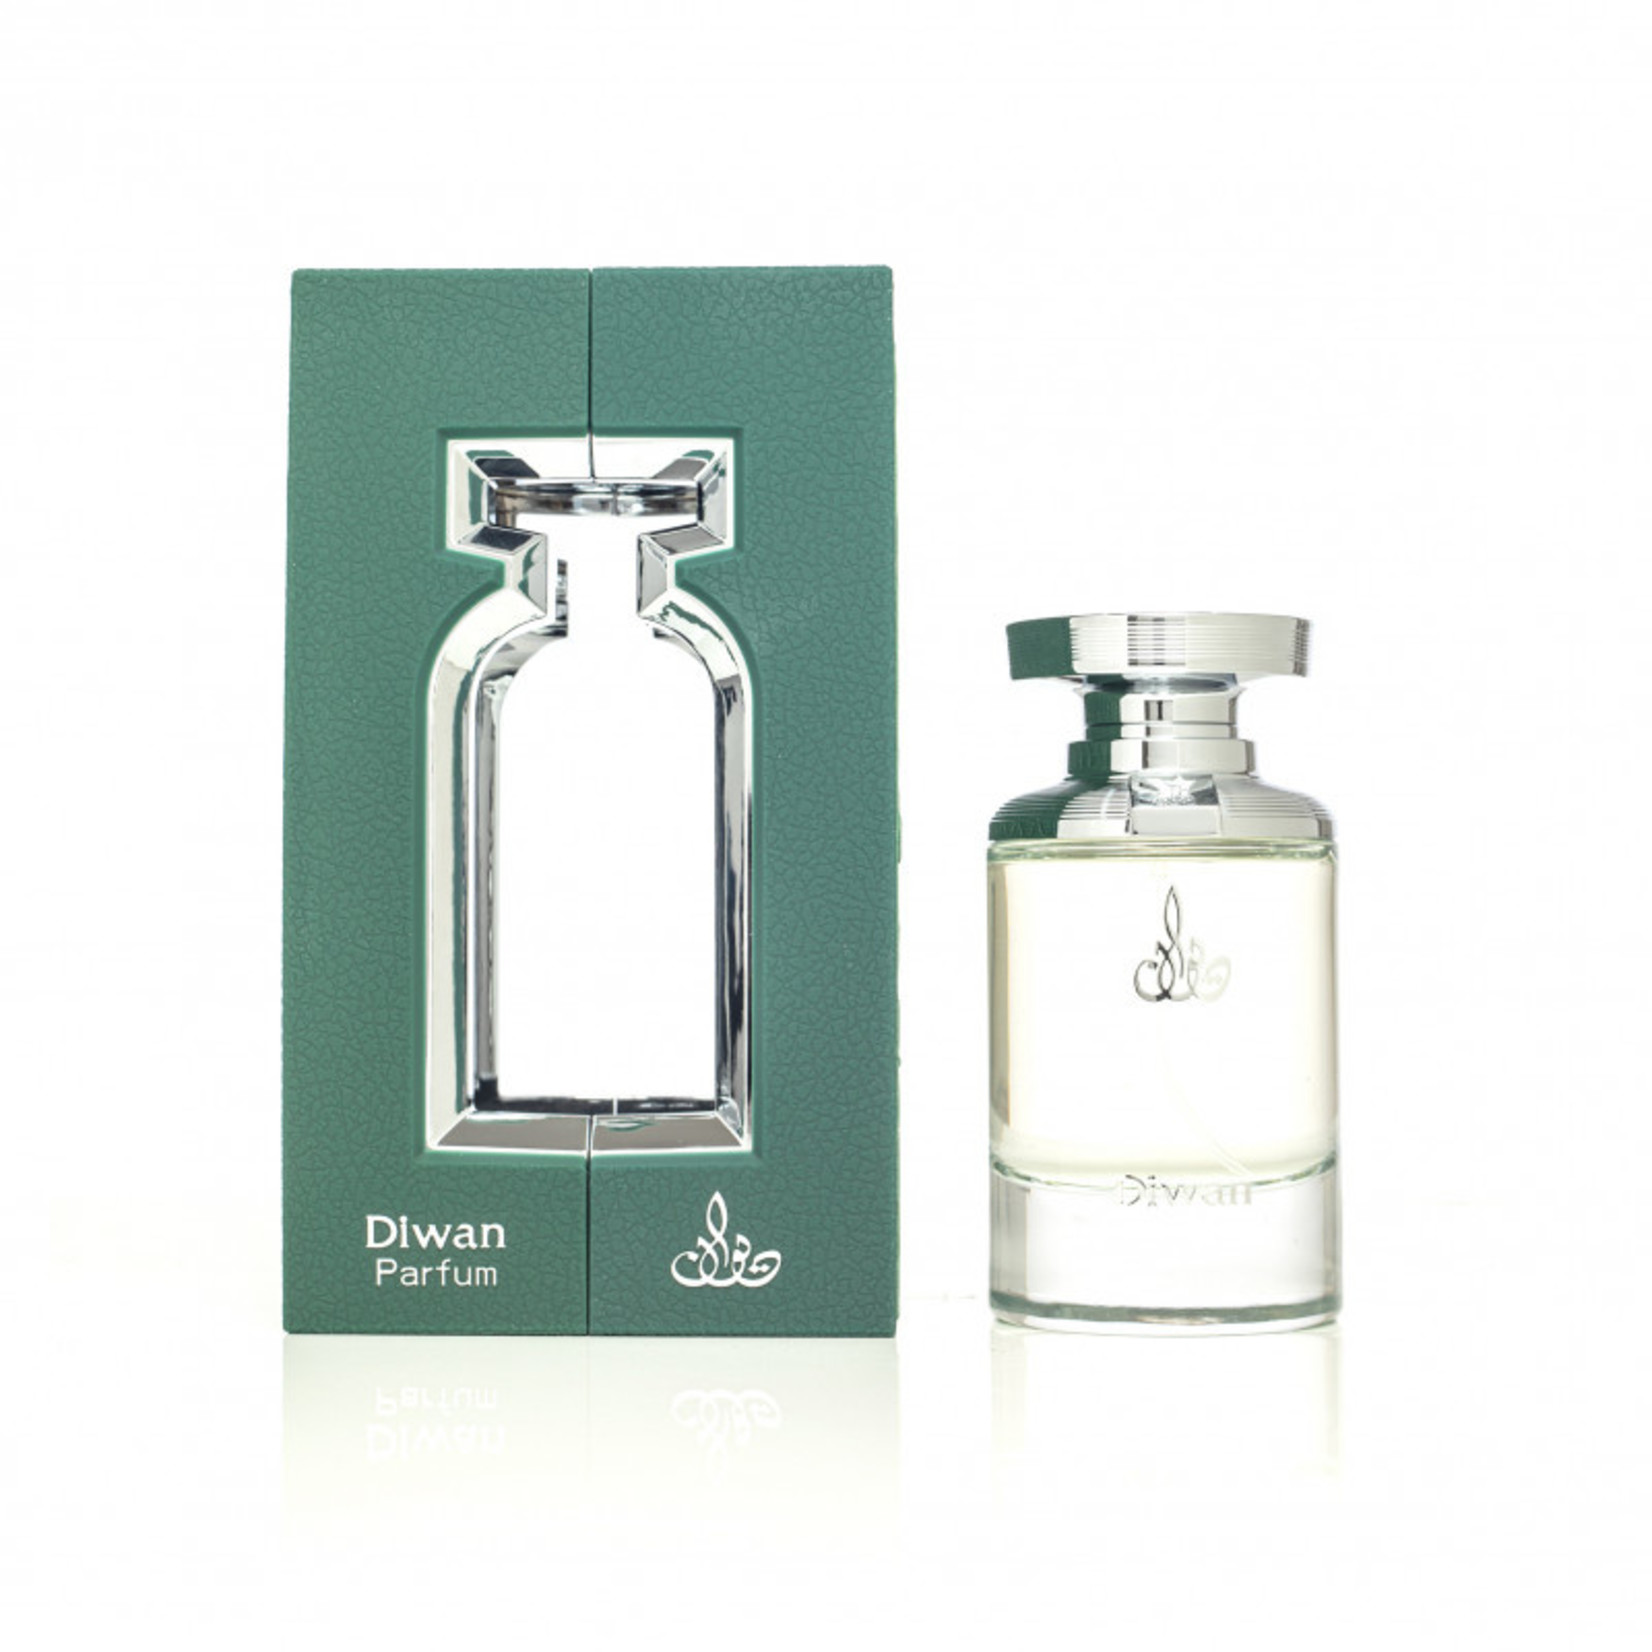 Diwan - 100ml Eau de Parfum